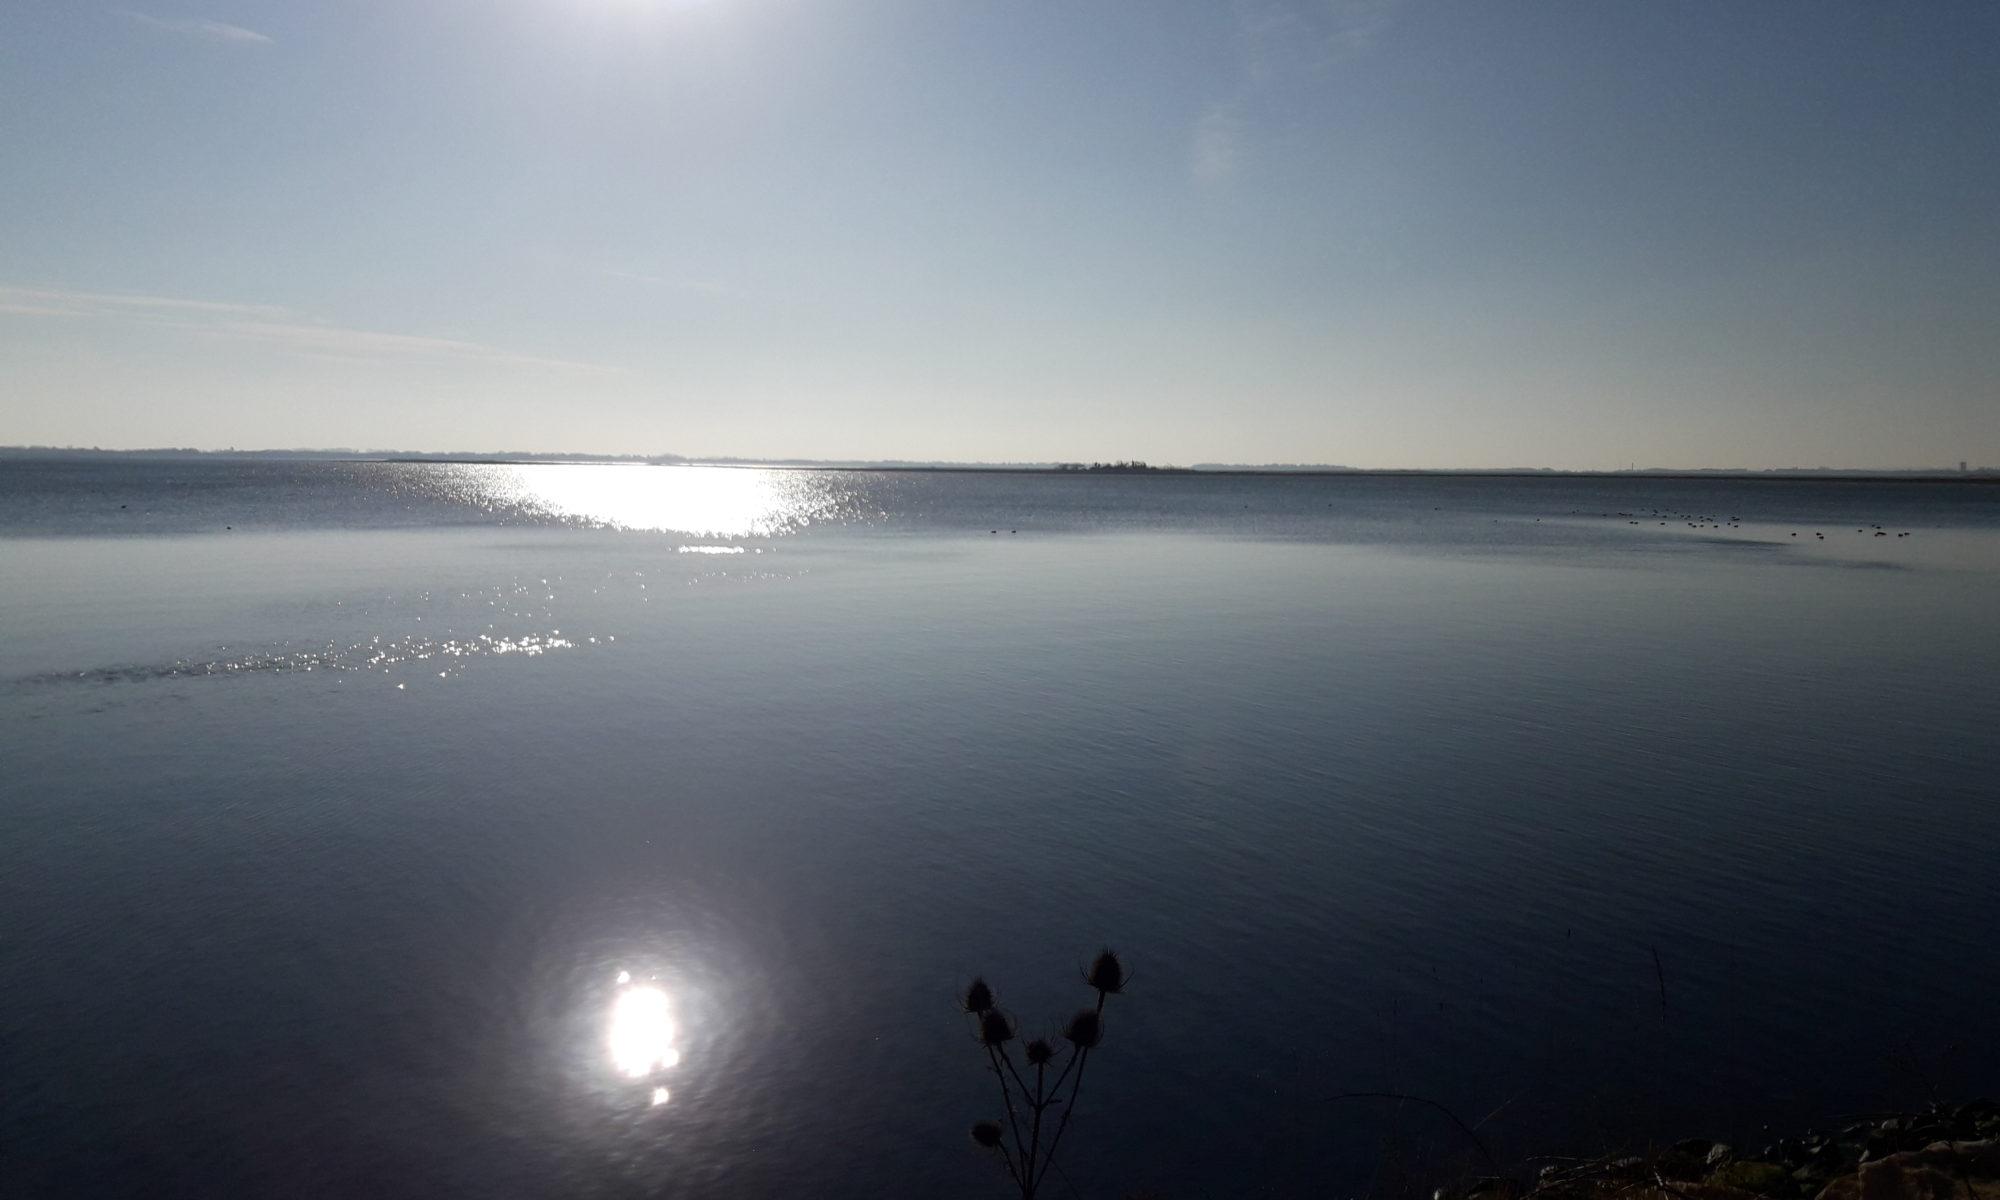 Sun shinning on the water